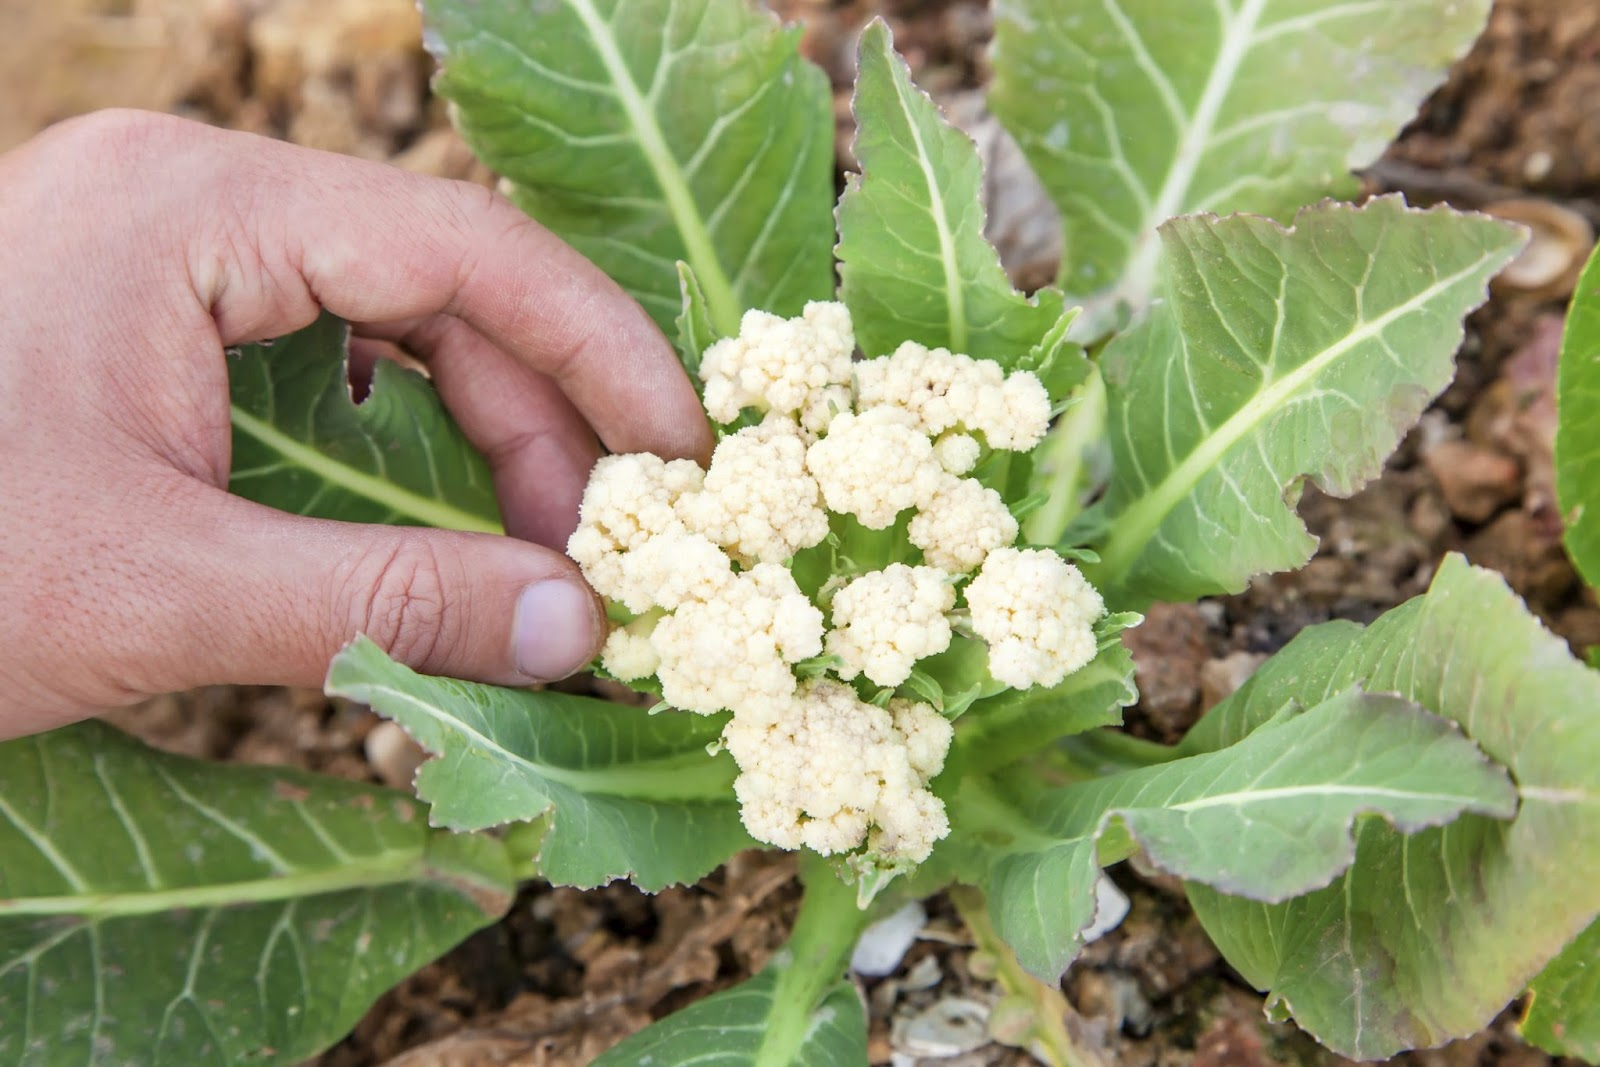 Buttoning of Cauliflower